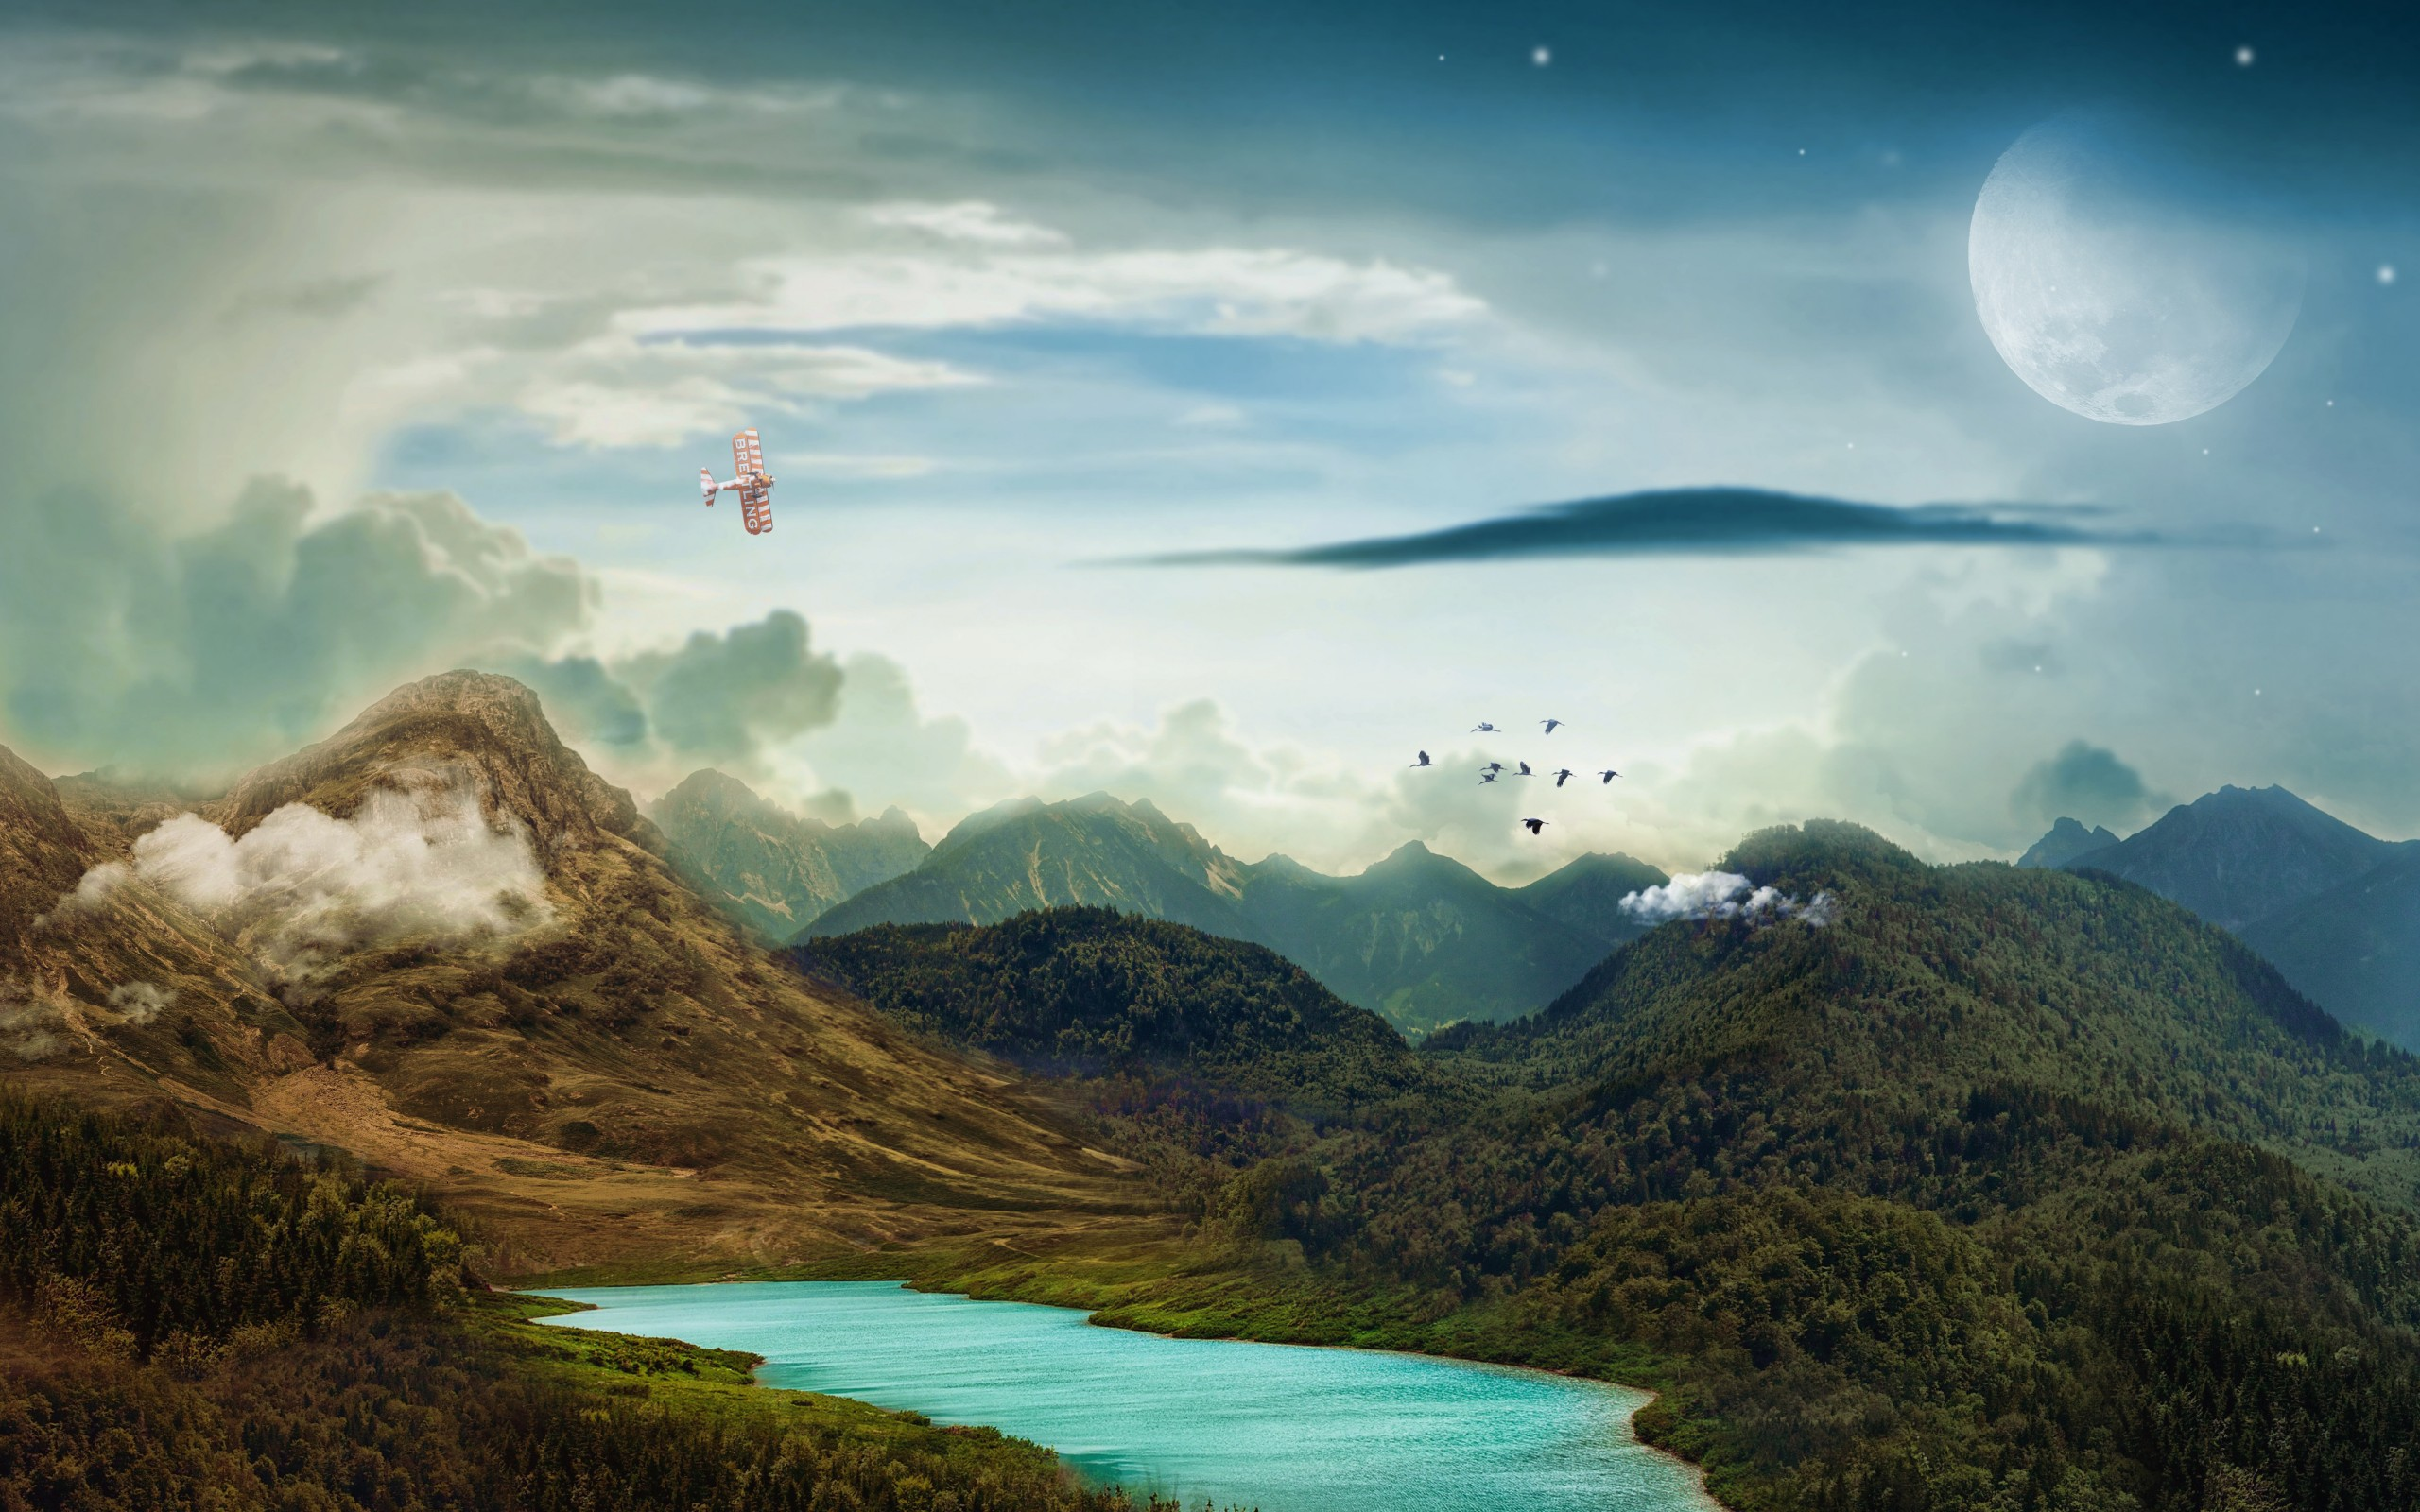 Green 3d Wallpaper Hd Mountains Landscape Moon 4k Wallpapers Hd Wallpapers